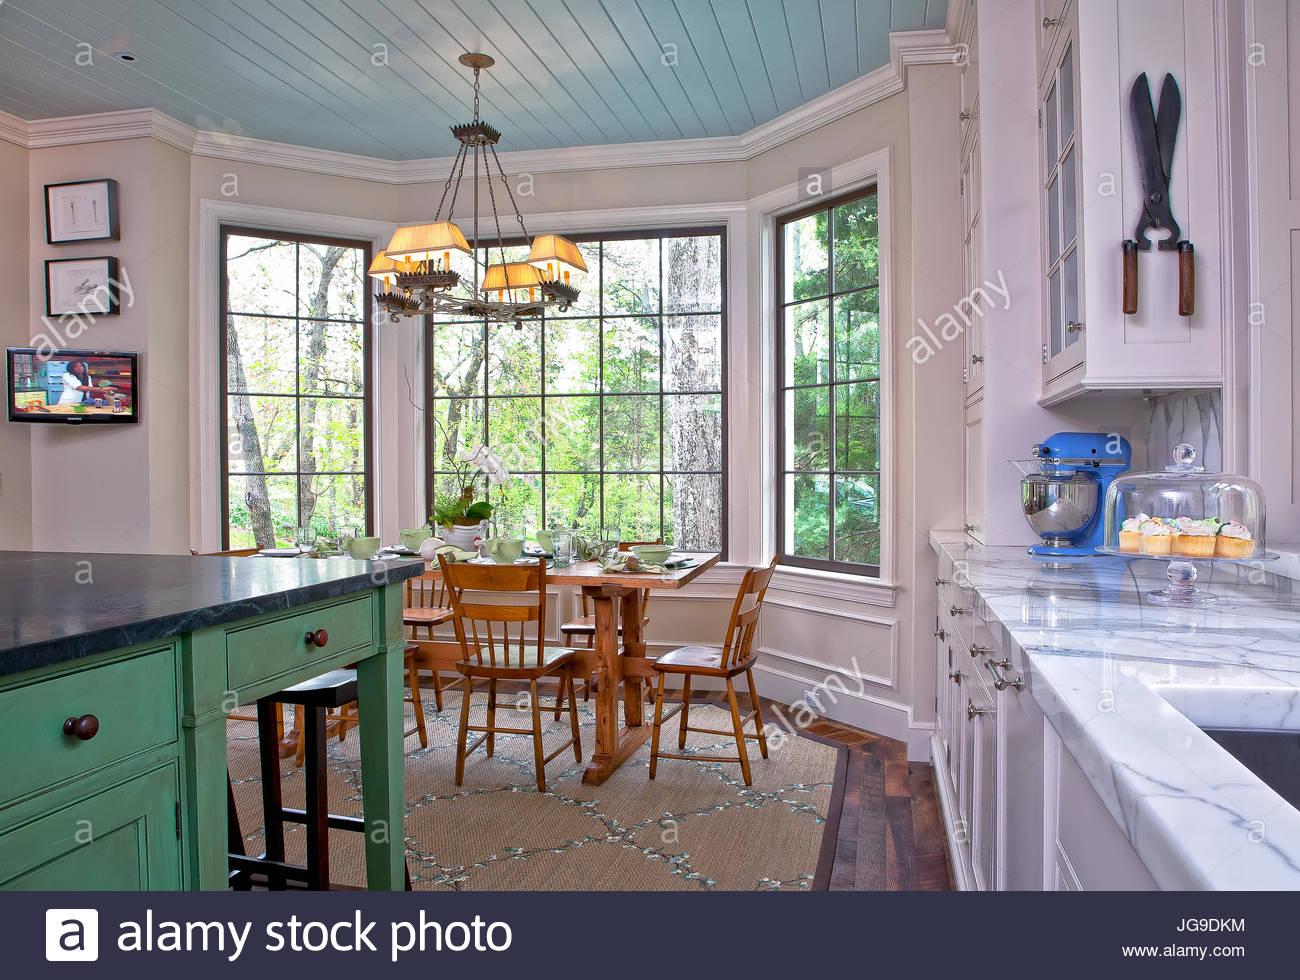 Land, Cottage-Küche, Aqua blau Decke, grüne Insel, Holzböden ...